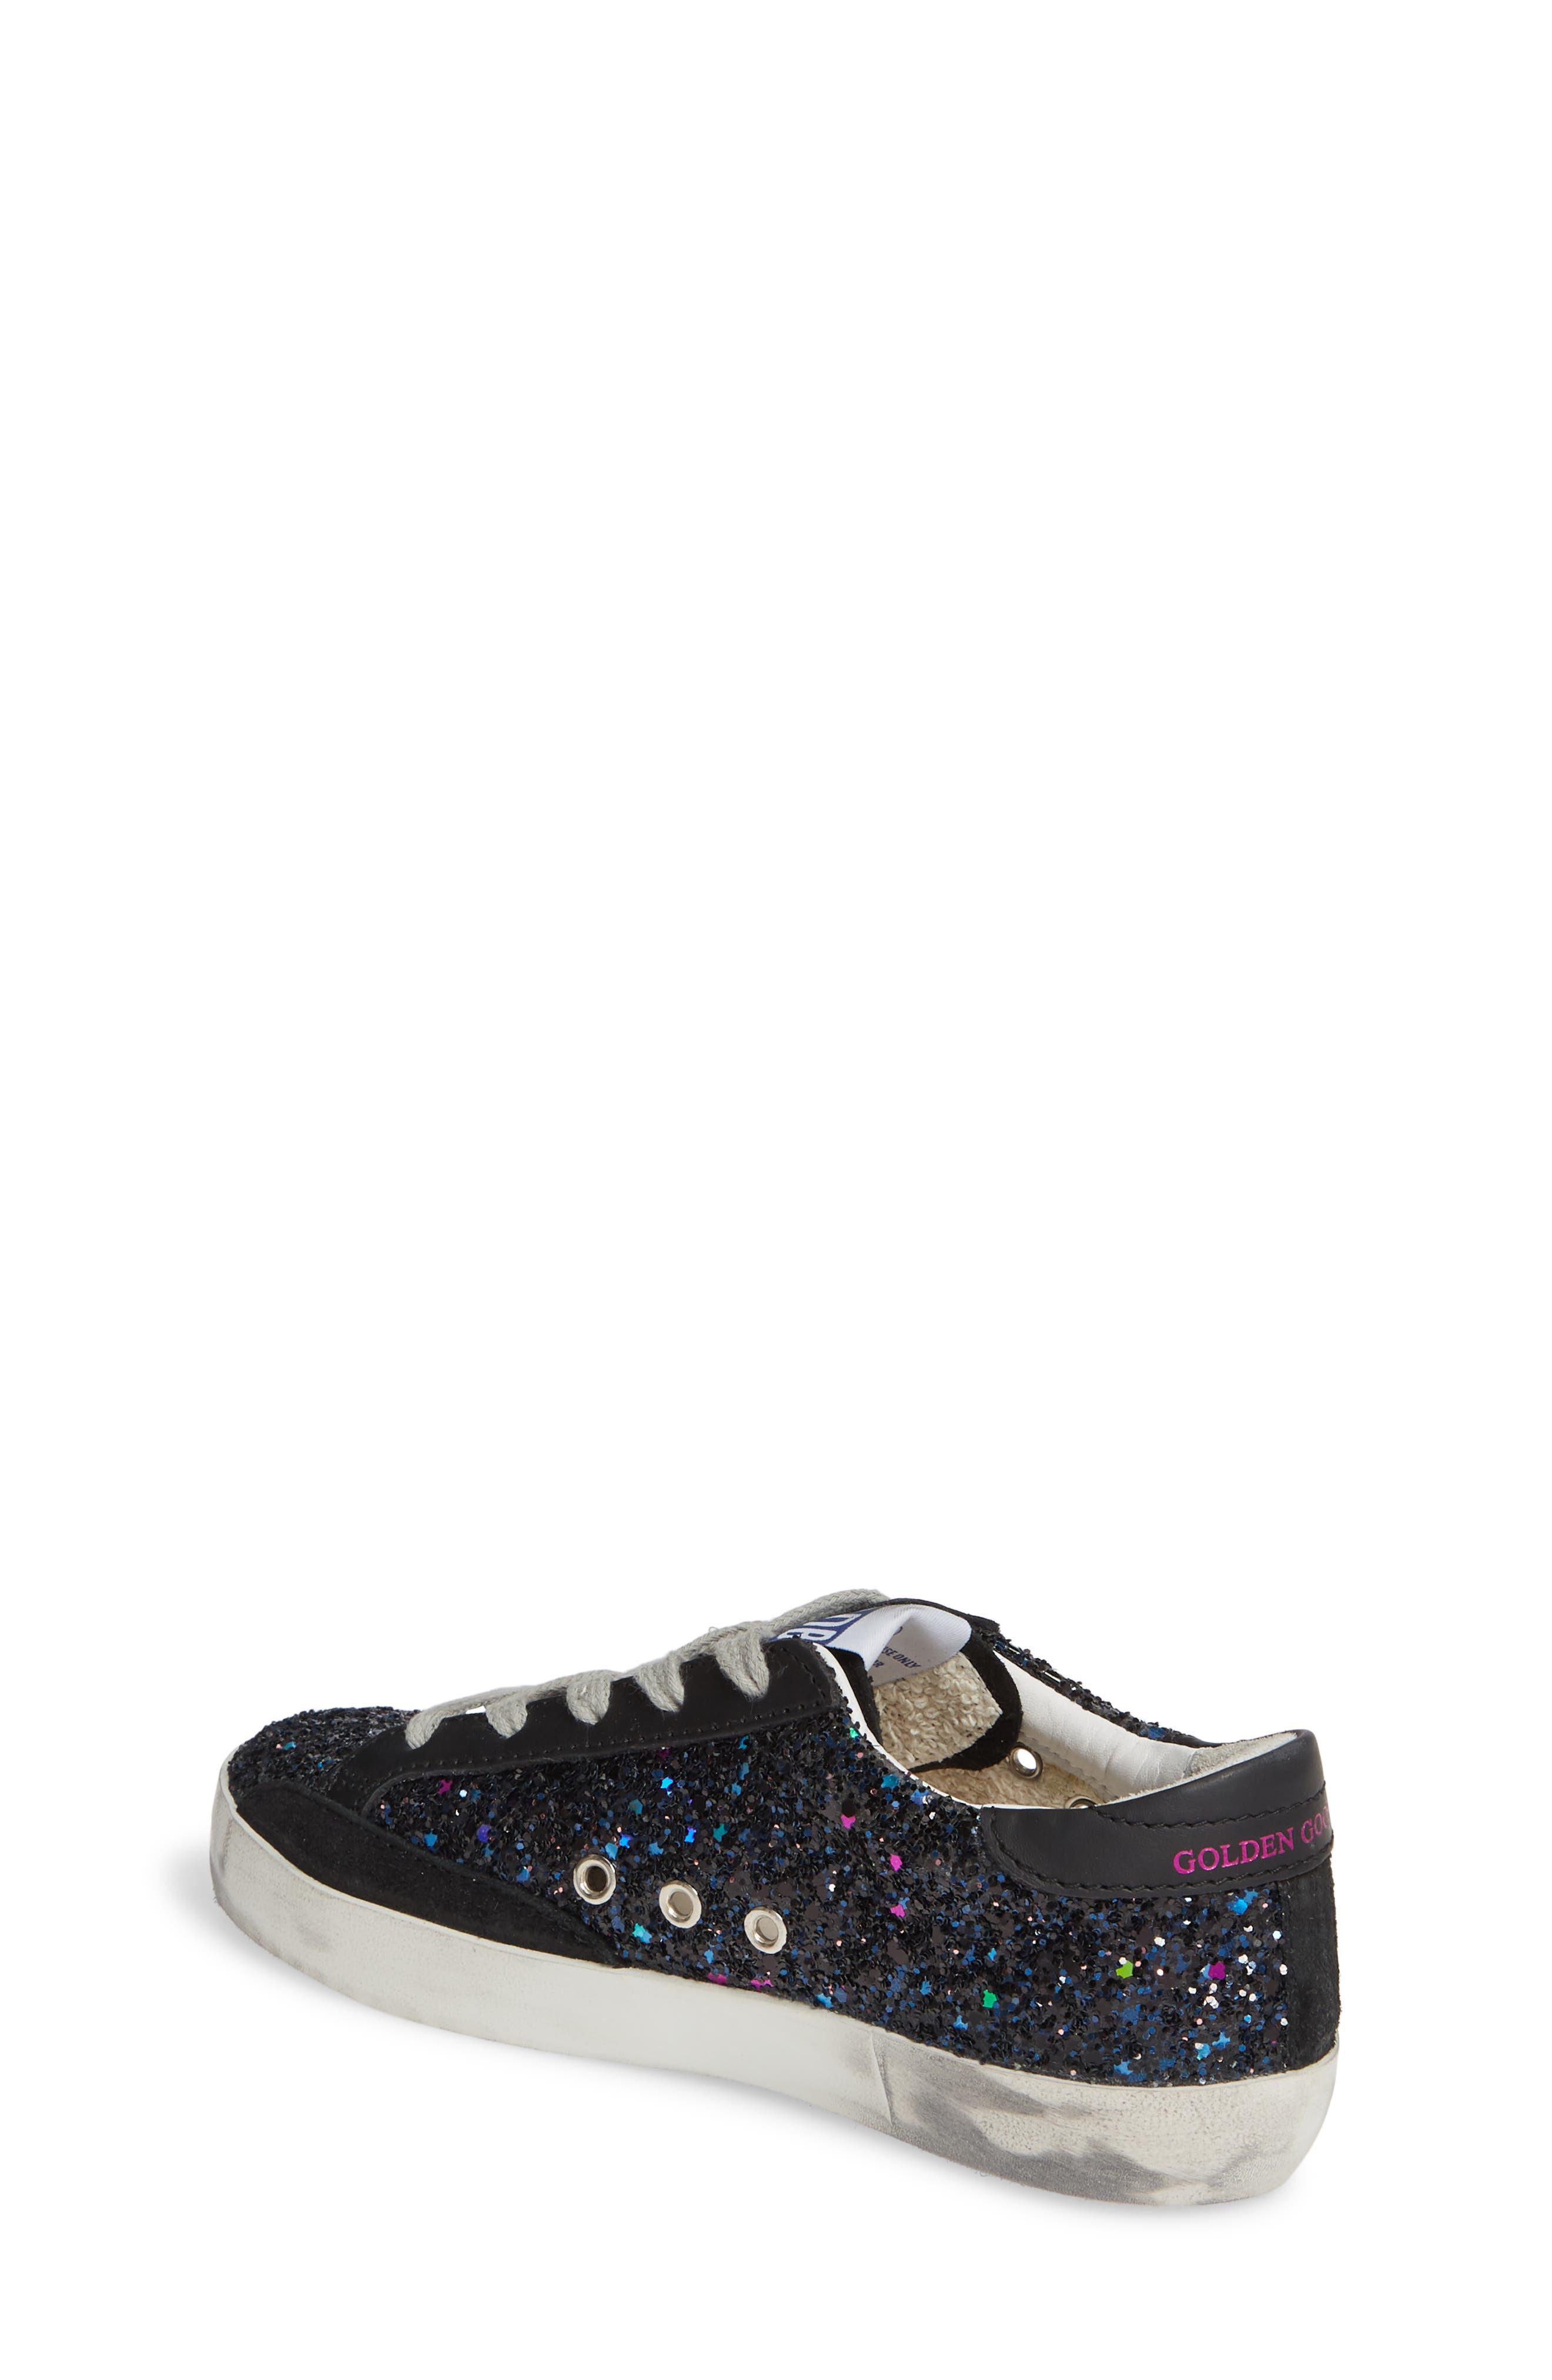 GOLDEN GOOSE,                             Superstar Glitter Low Top Sneaker,                             Alternate thumbnail 2, color,                             GALAXY GLITTER/ FUCHSIA STAR